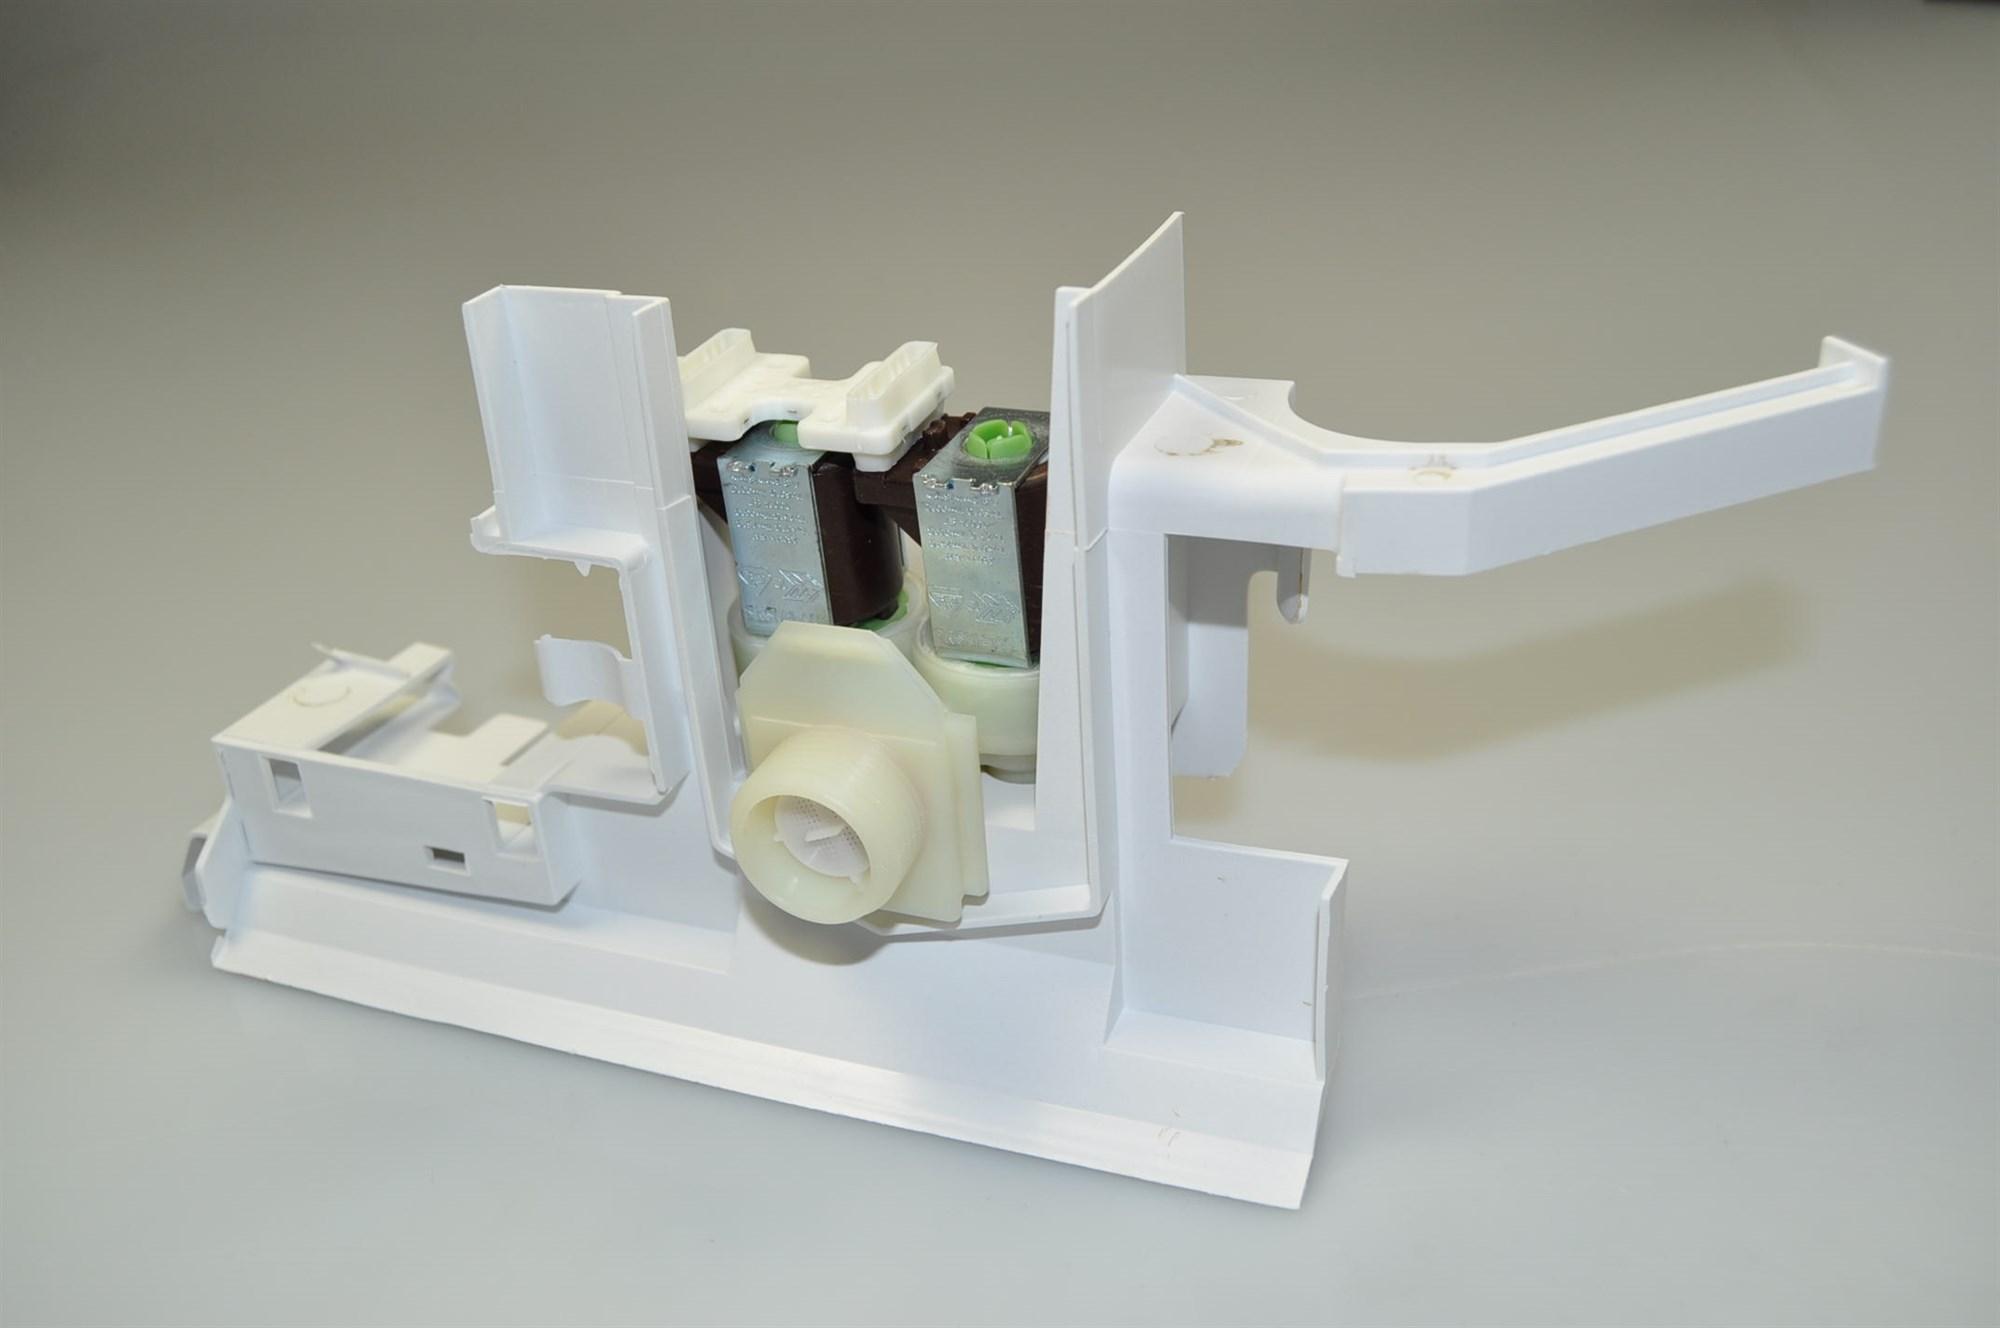 magnetventil siemens waschmaschine. Black Bedroom Furniture Sets. Home Design Ideas